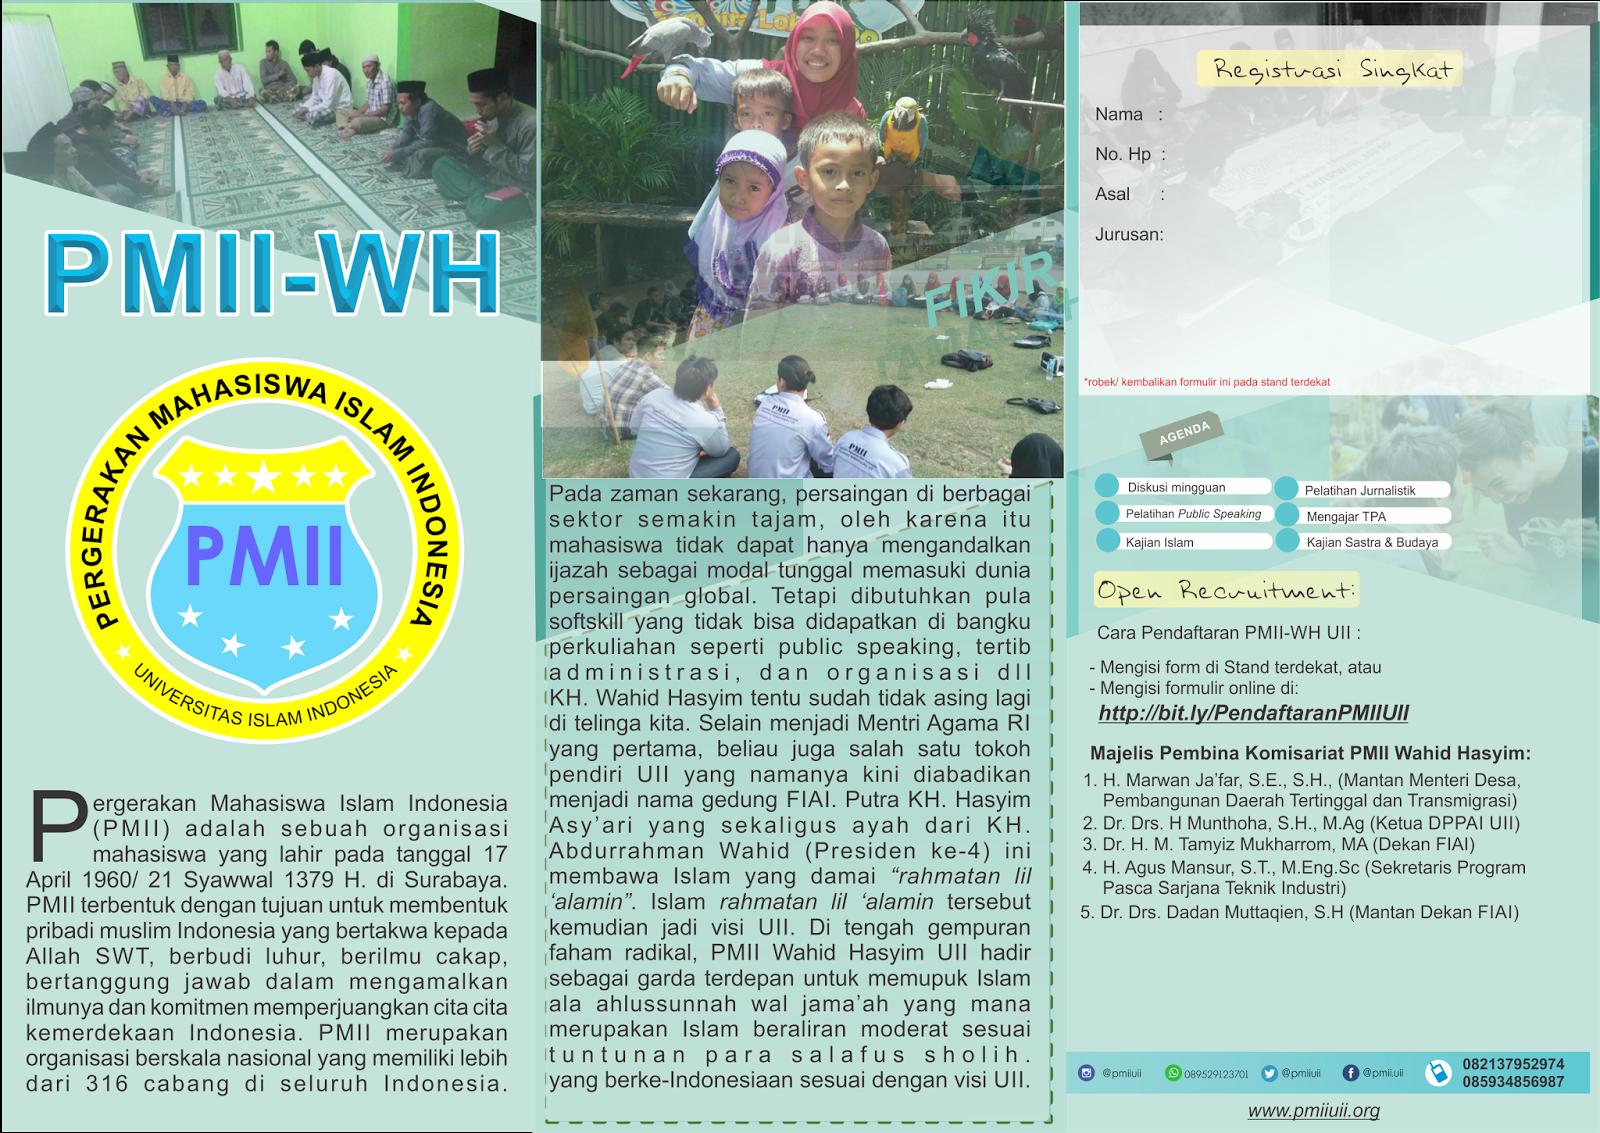 Brosur Pmii Komisariat Wahid Hasyim Uii Official Pmii Komisariat